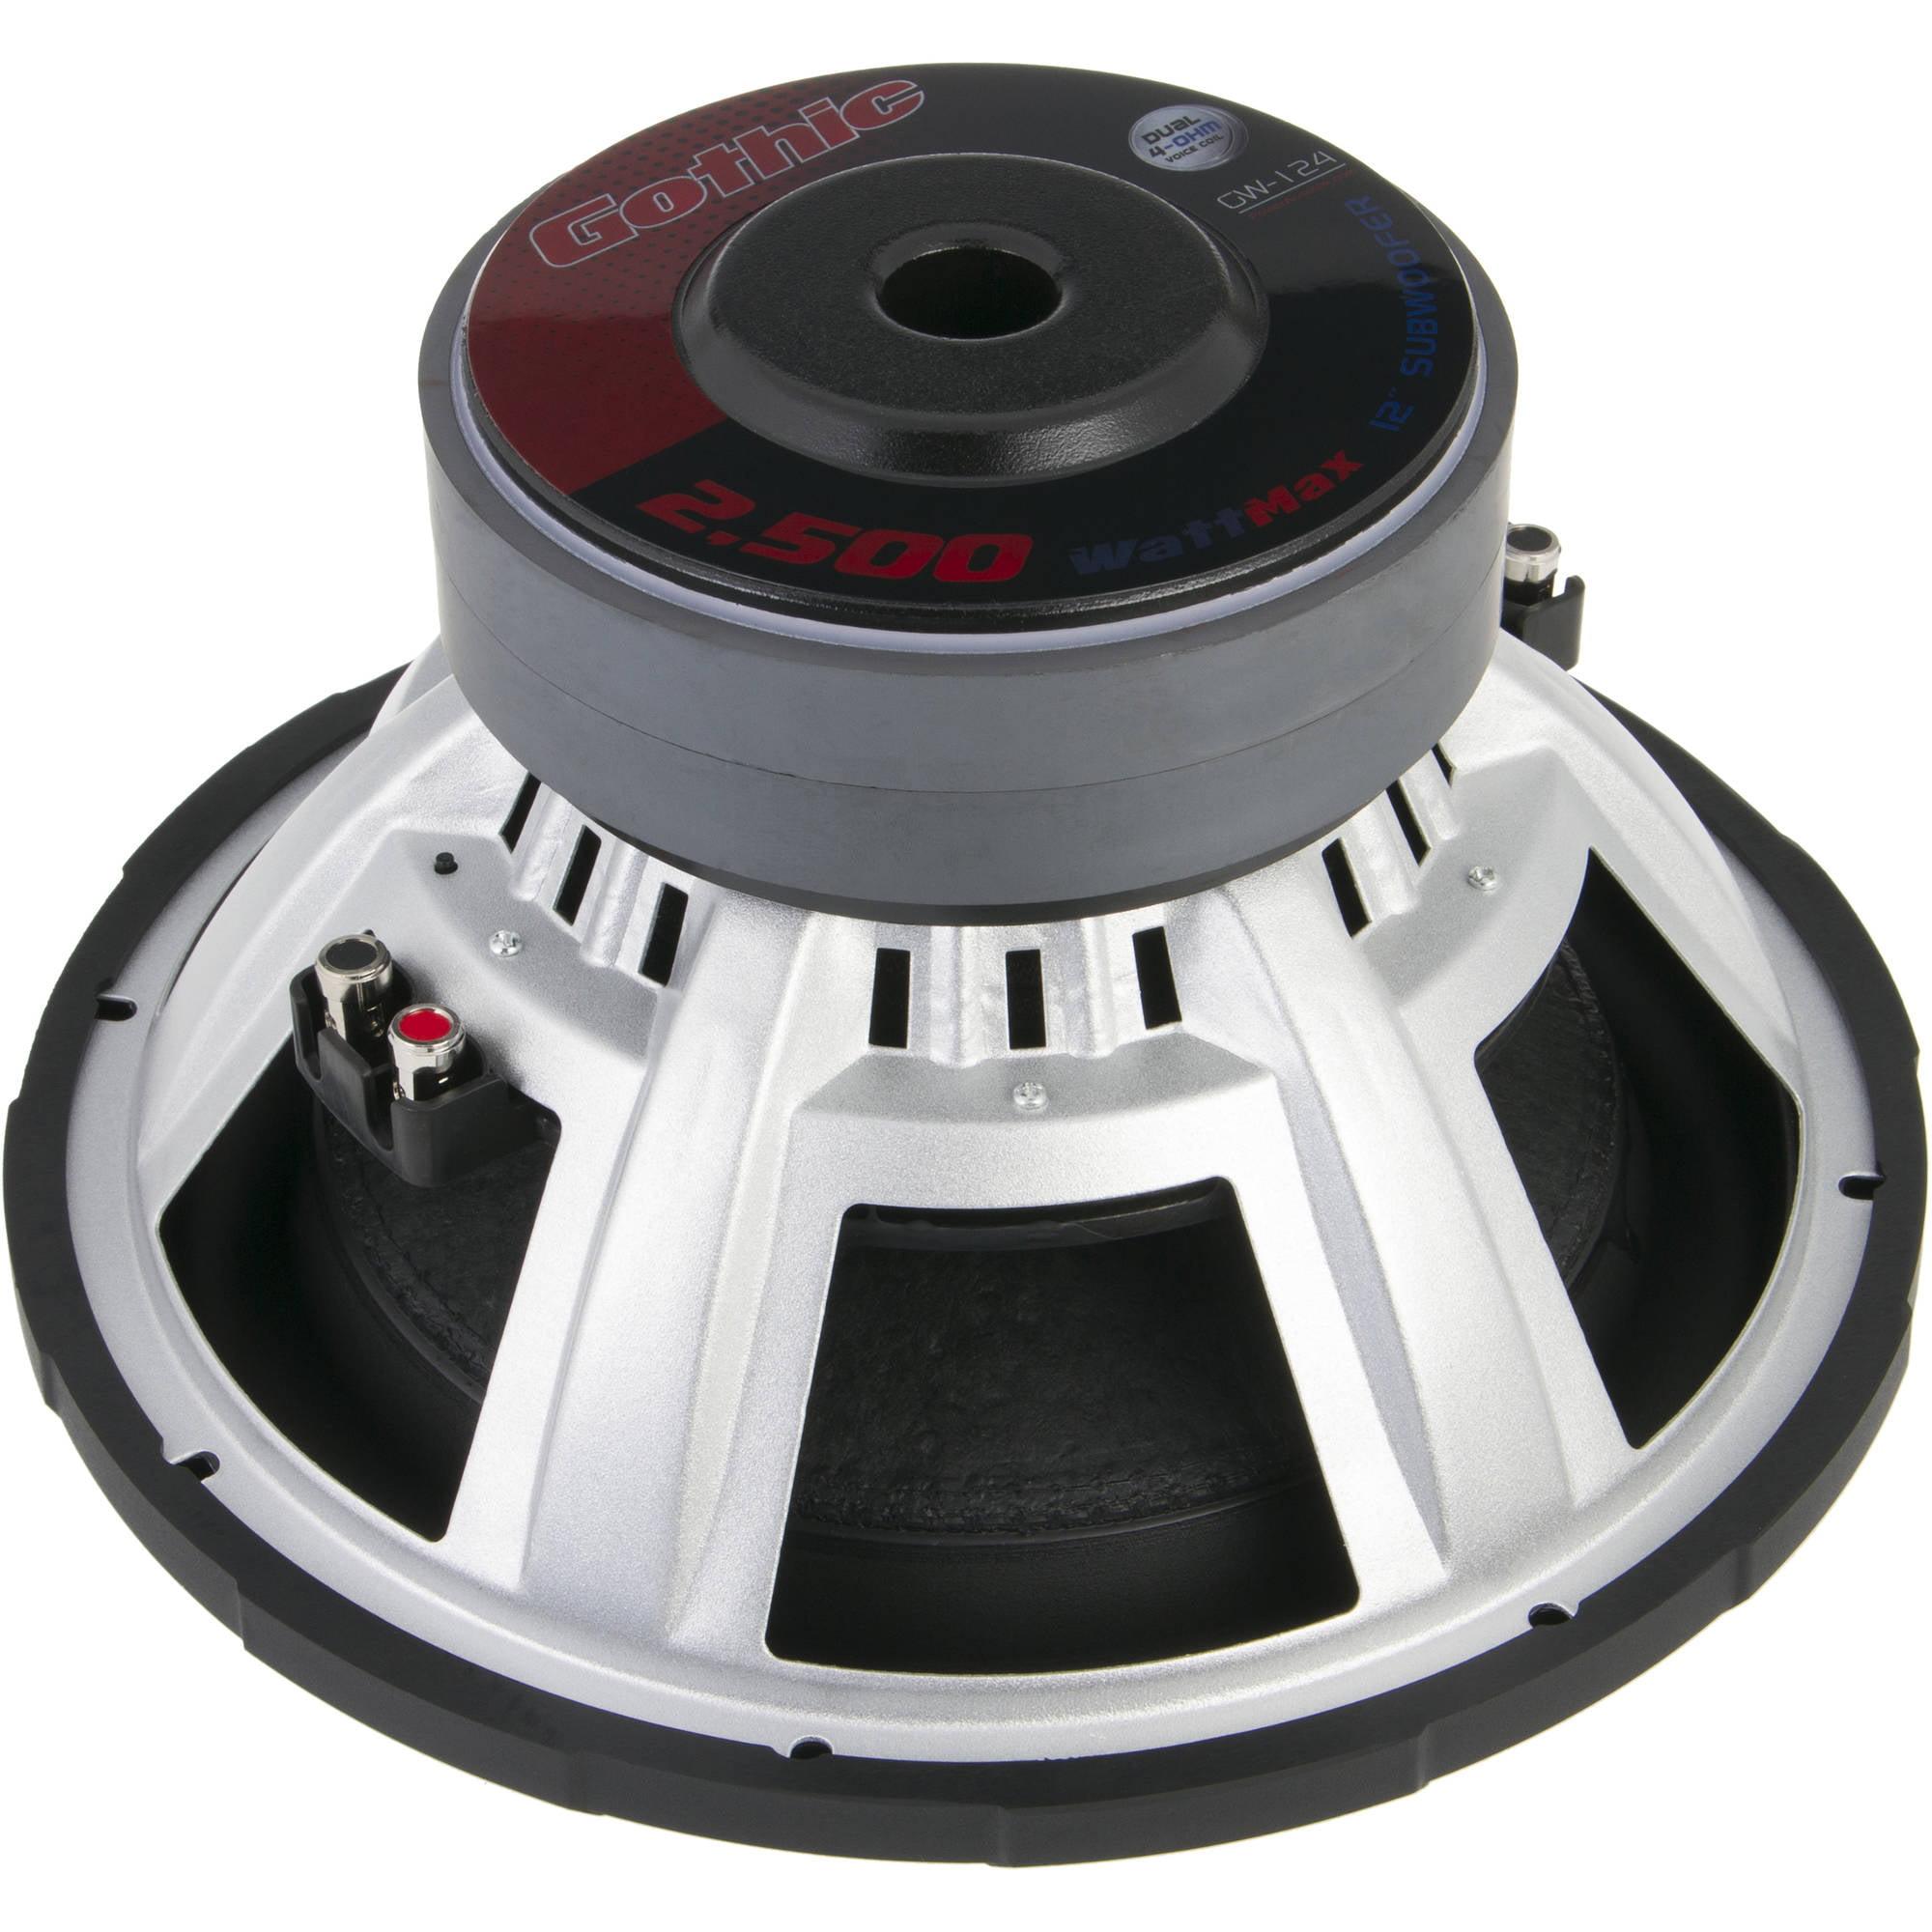 Power Acoustik Gw 124 Car 2500w Max 12 Subwoofer 2 Ohm Speaker Wiring Series Diagram